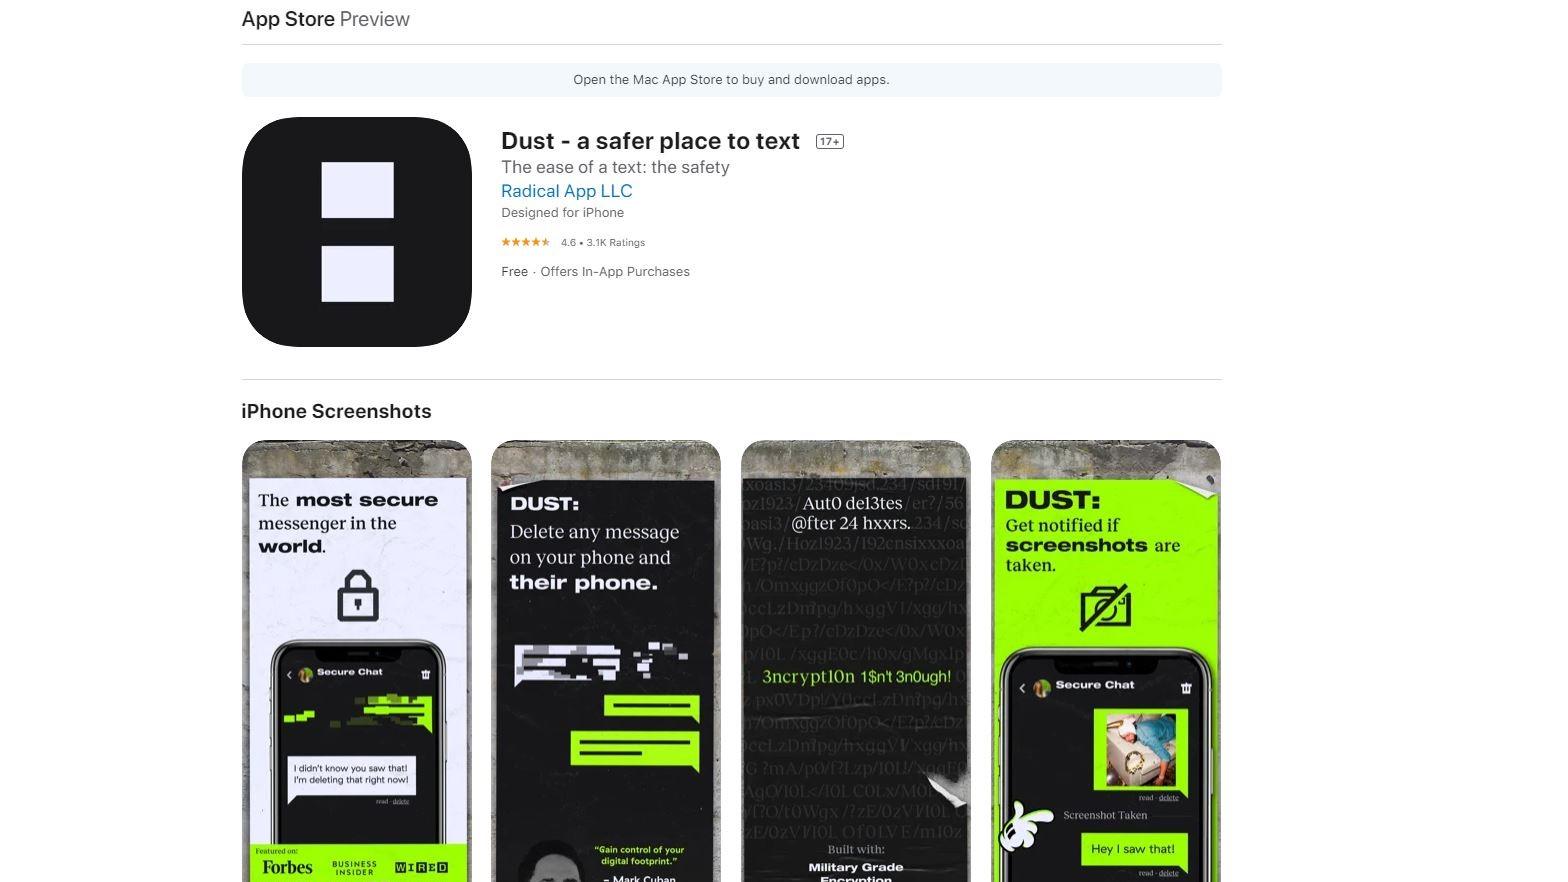 Dust App Store